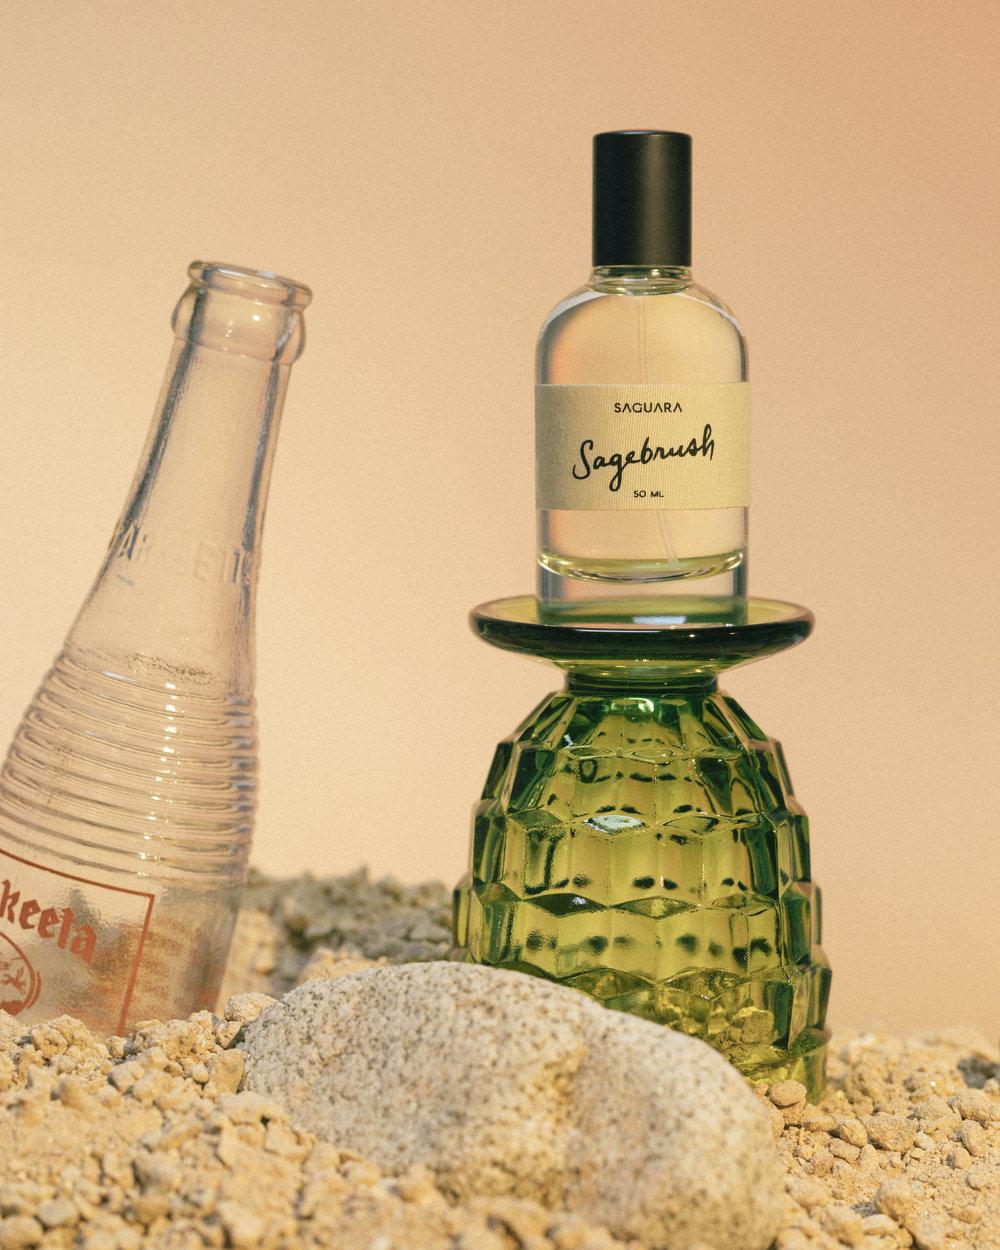 Saguara Perfumes - Sagebrush